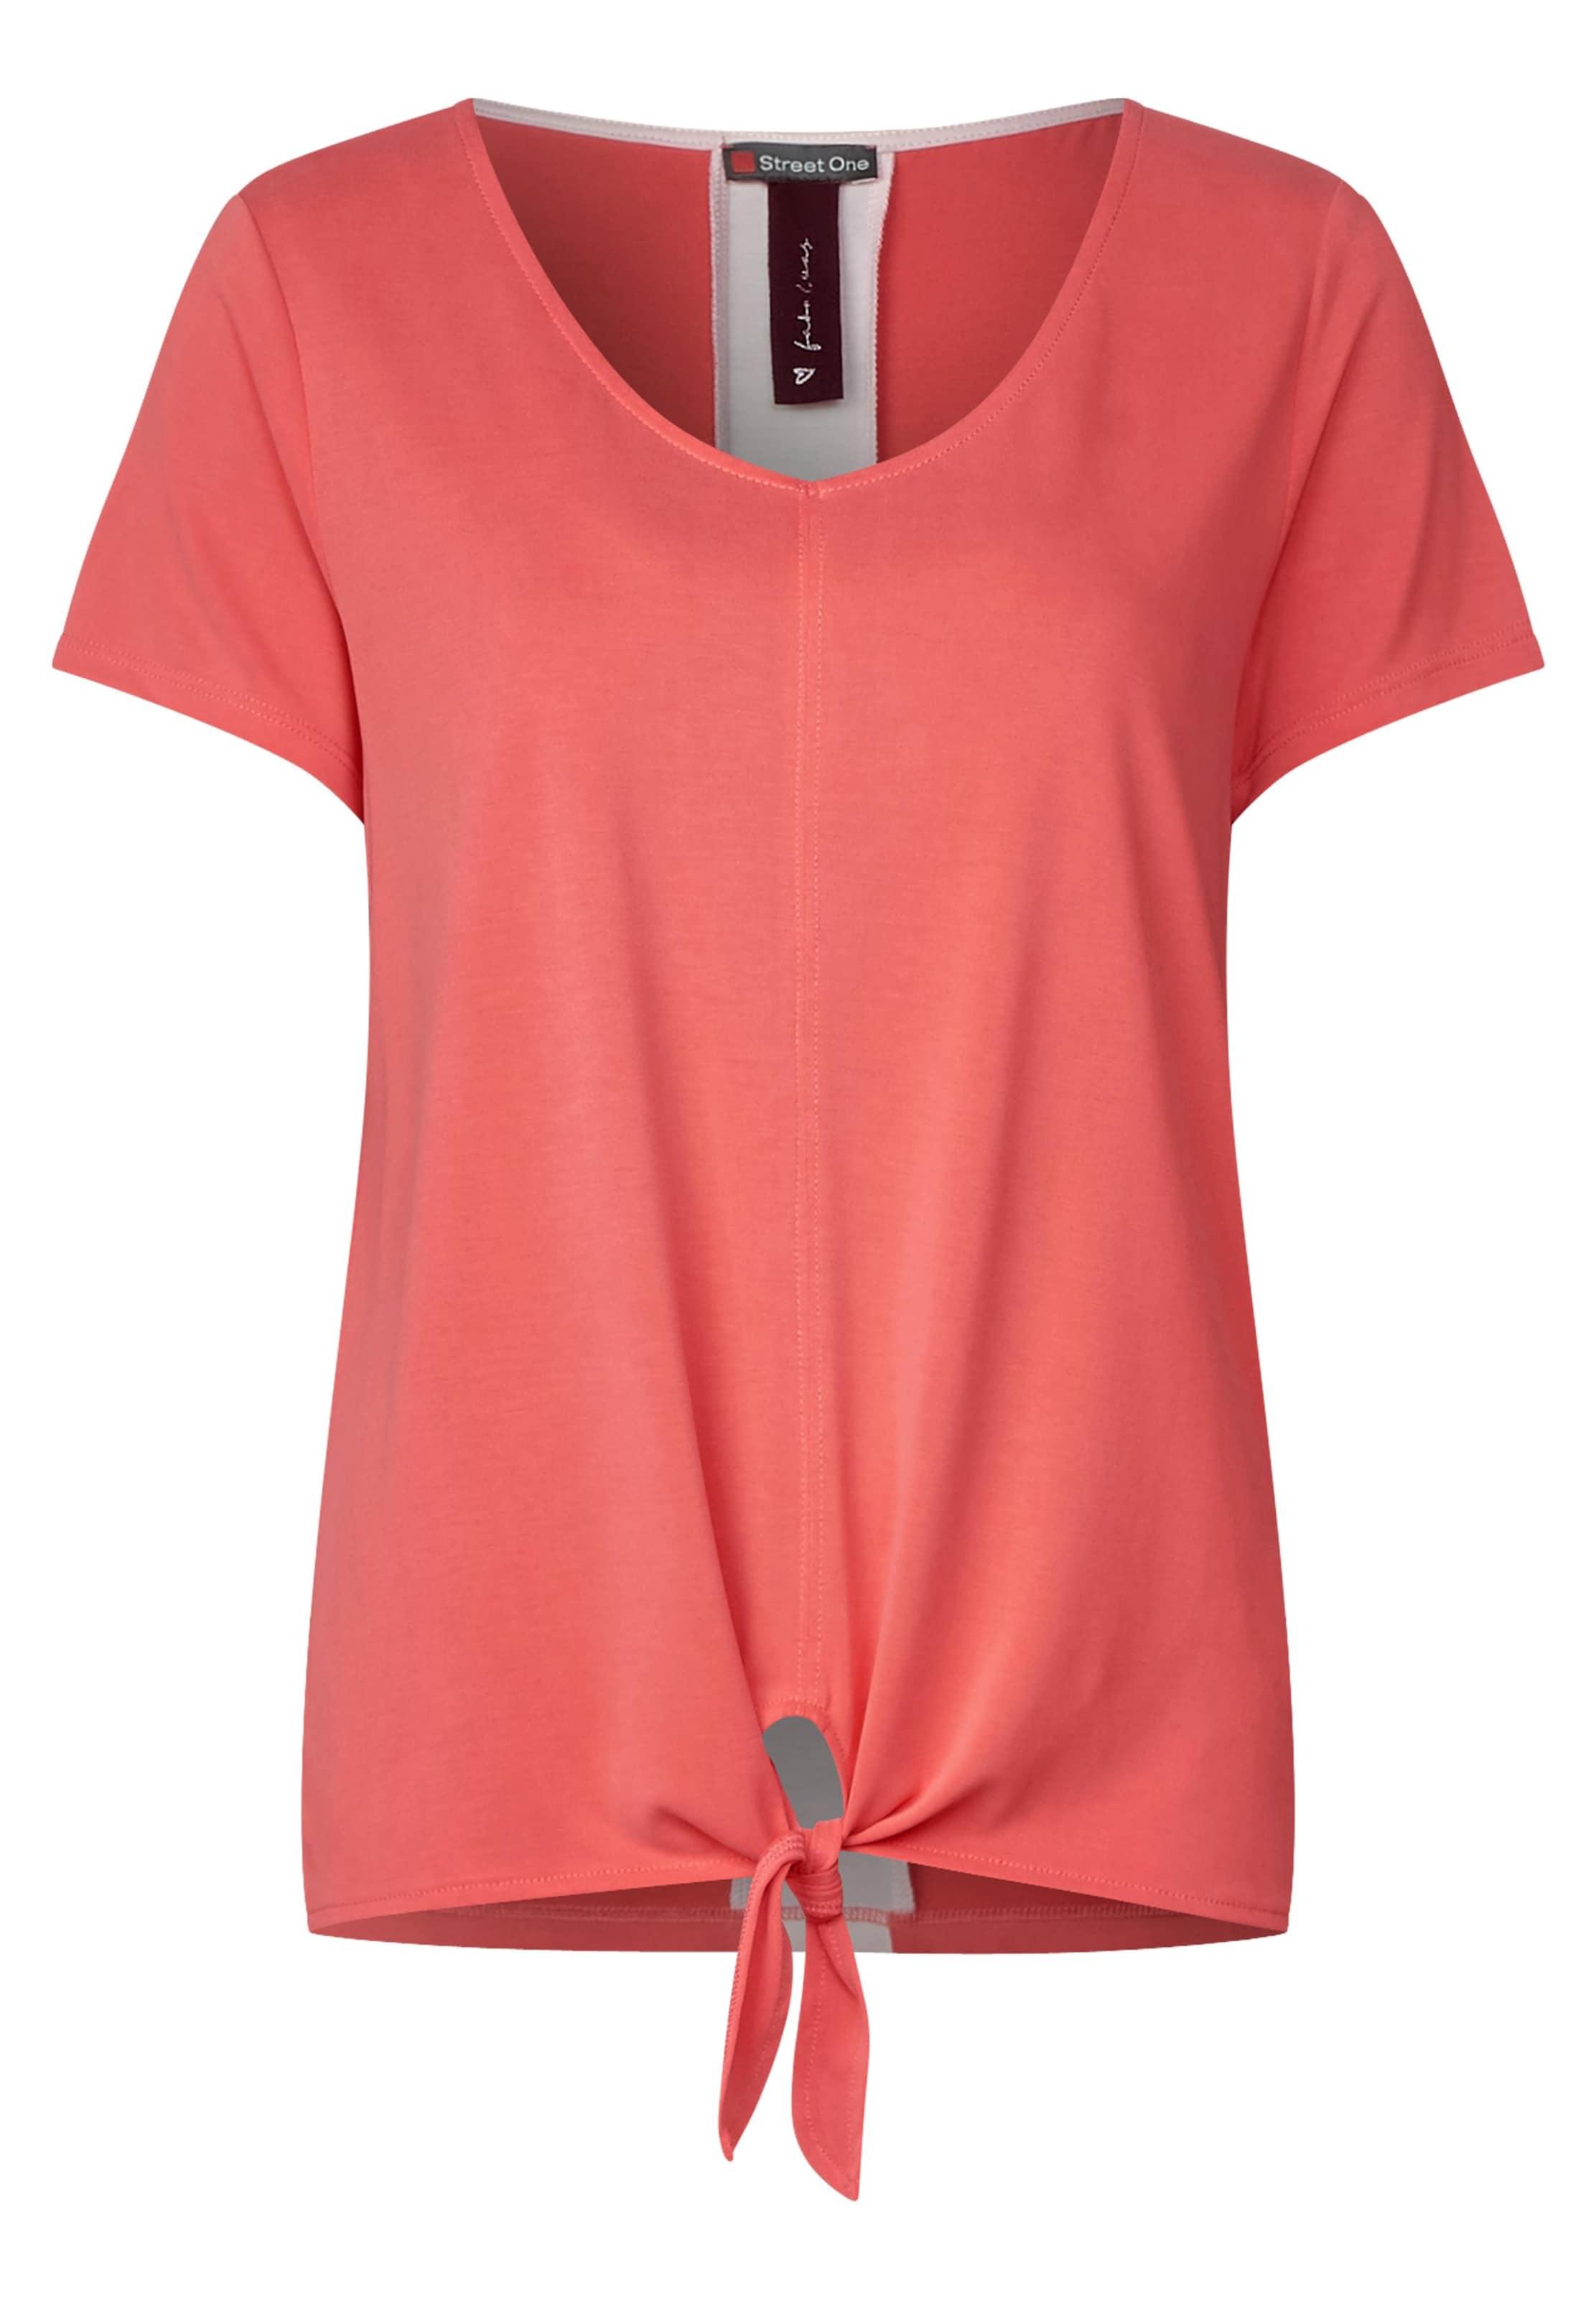 Street Street One KoralleAltrosa In Shirt One One In KoralleAltrosa Shirt Street Shirt CxtdQshr